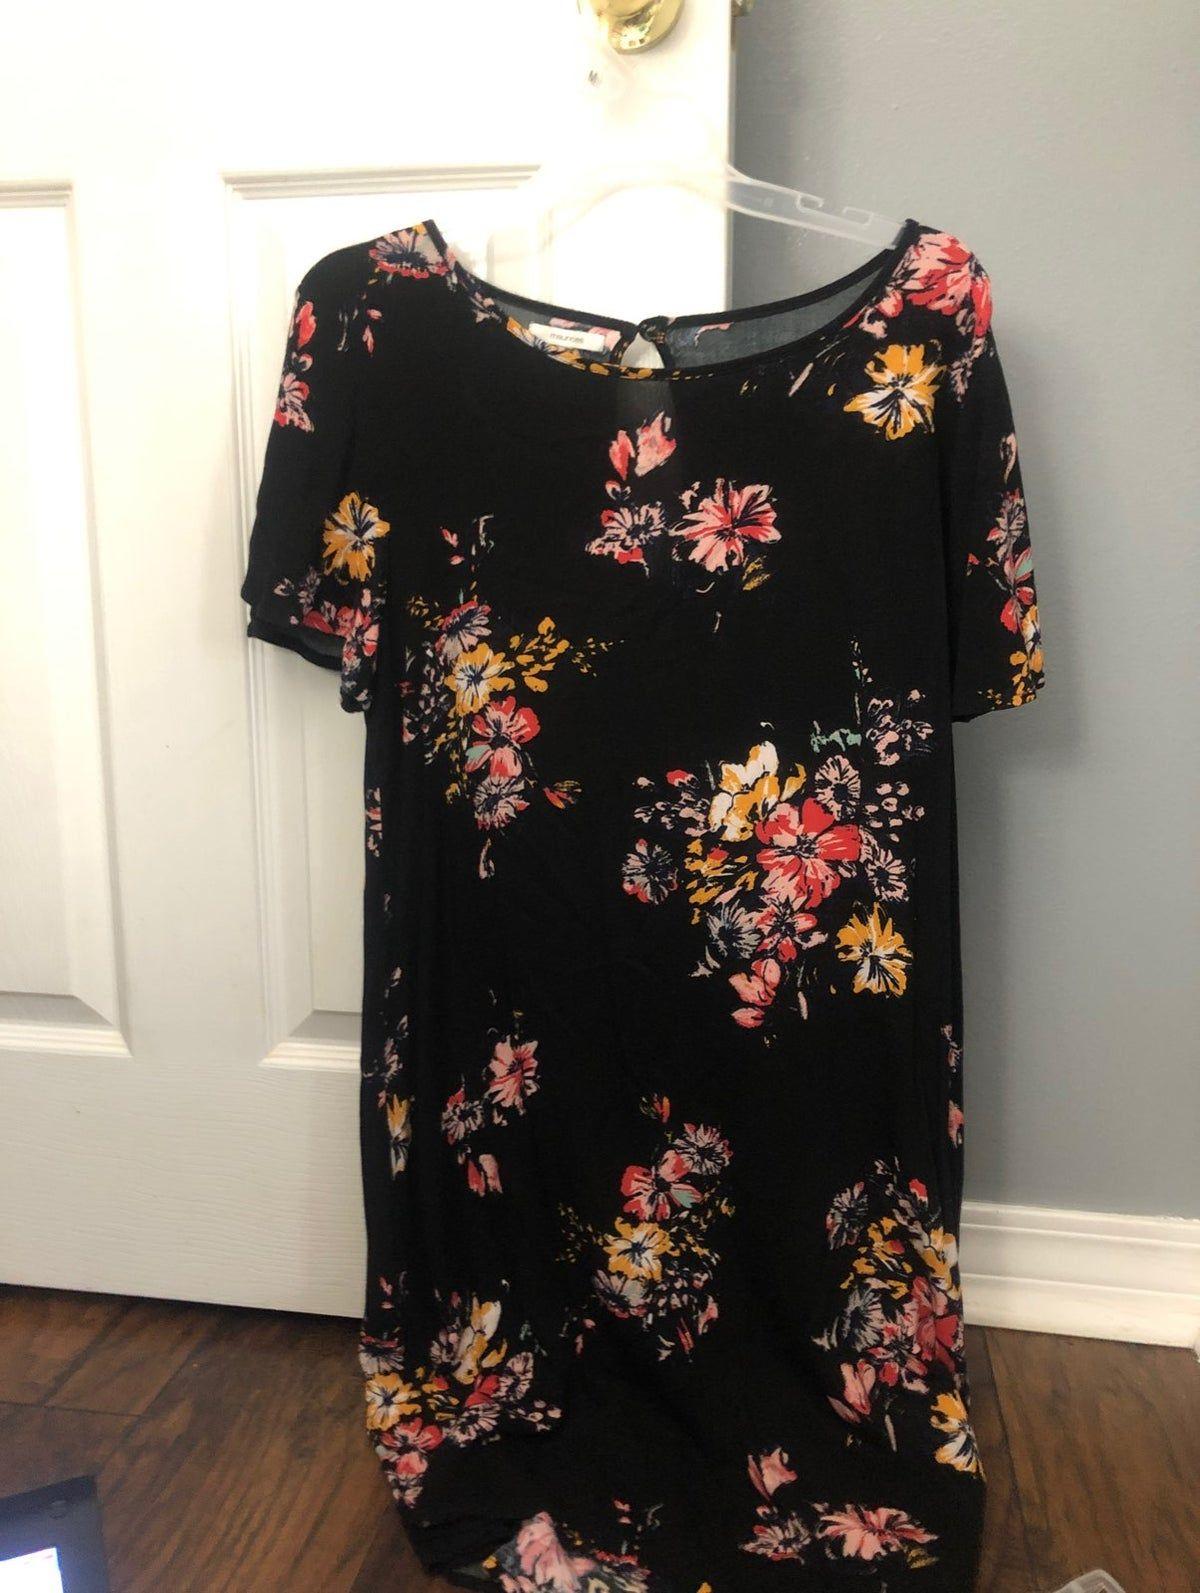 Pin By Ewa S On Dresses Dresses Floral Dress Black Short Sleeve Dresses [ 1593 x 1200 Pixel ]